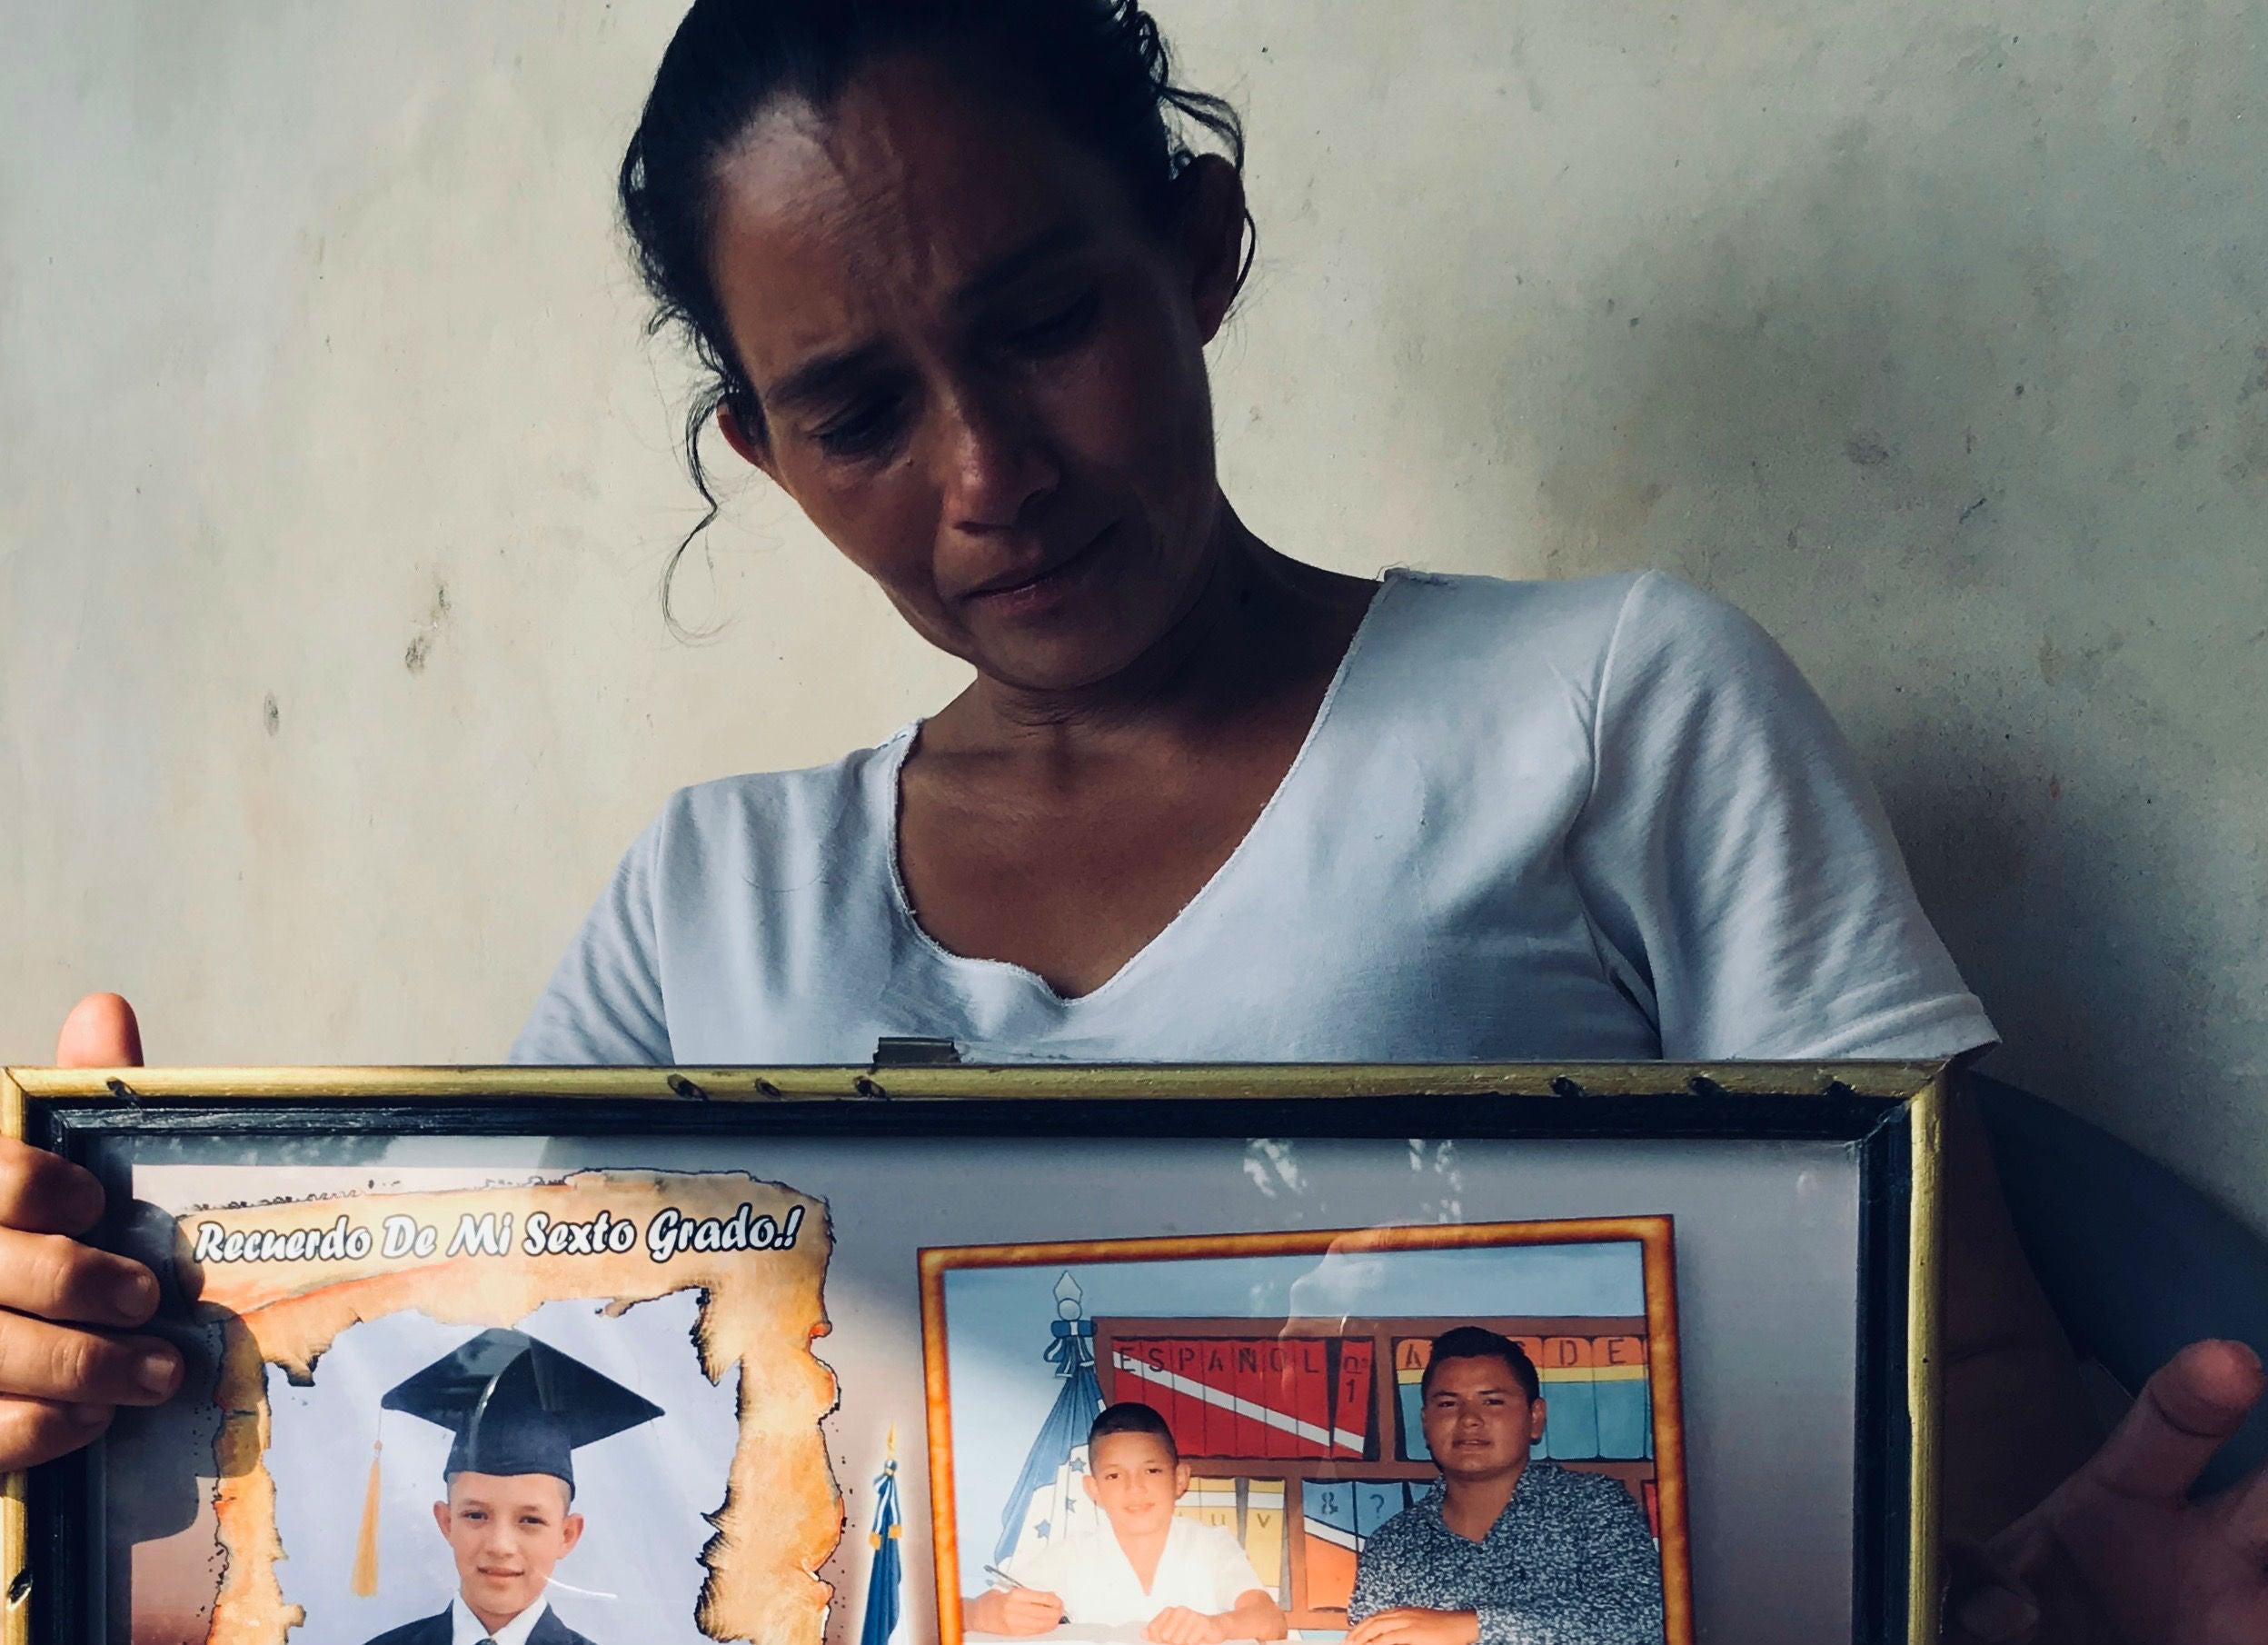 Honduras dating culture